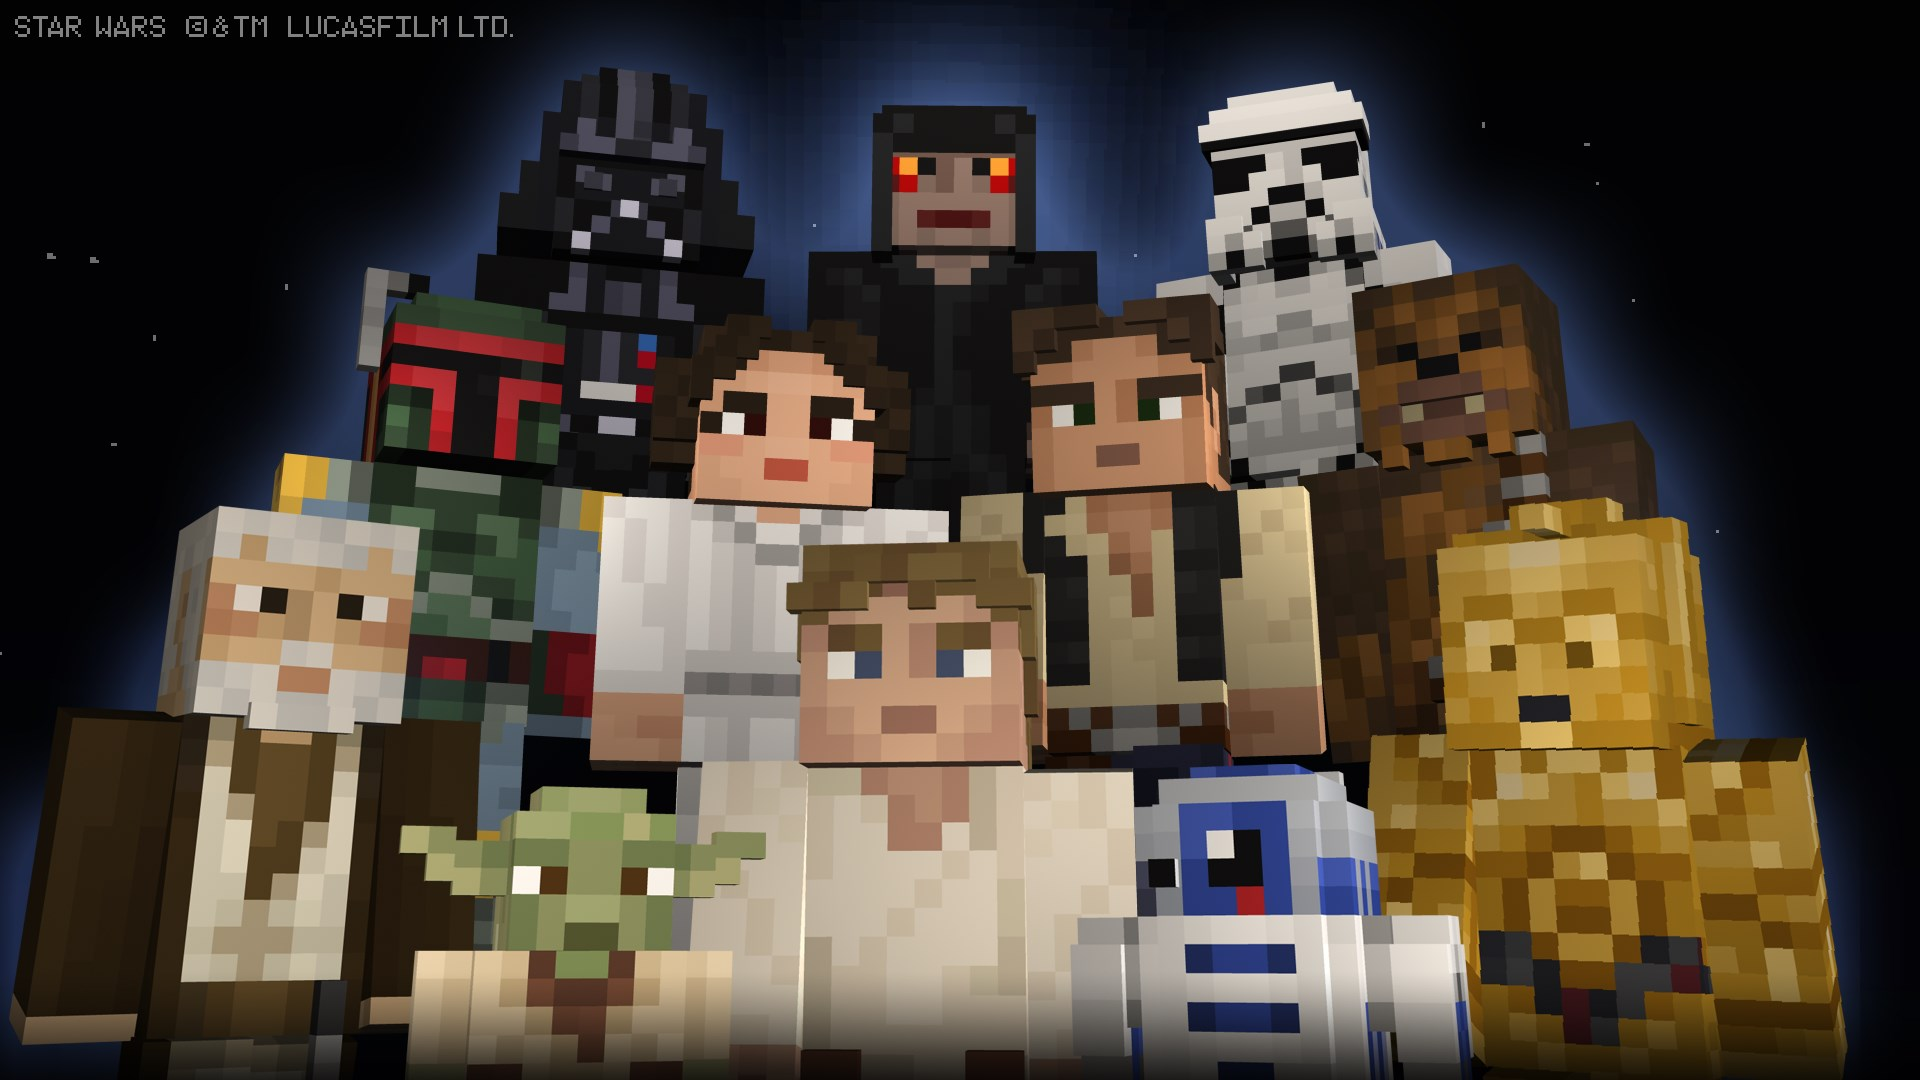 Star Wars Classic Skin Pack